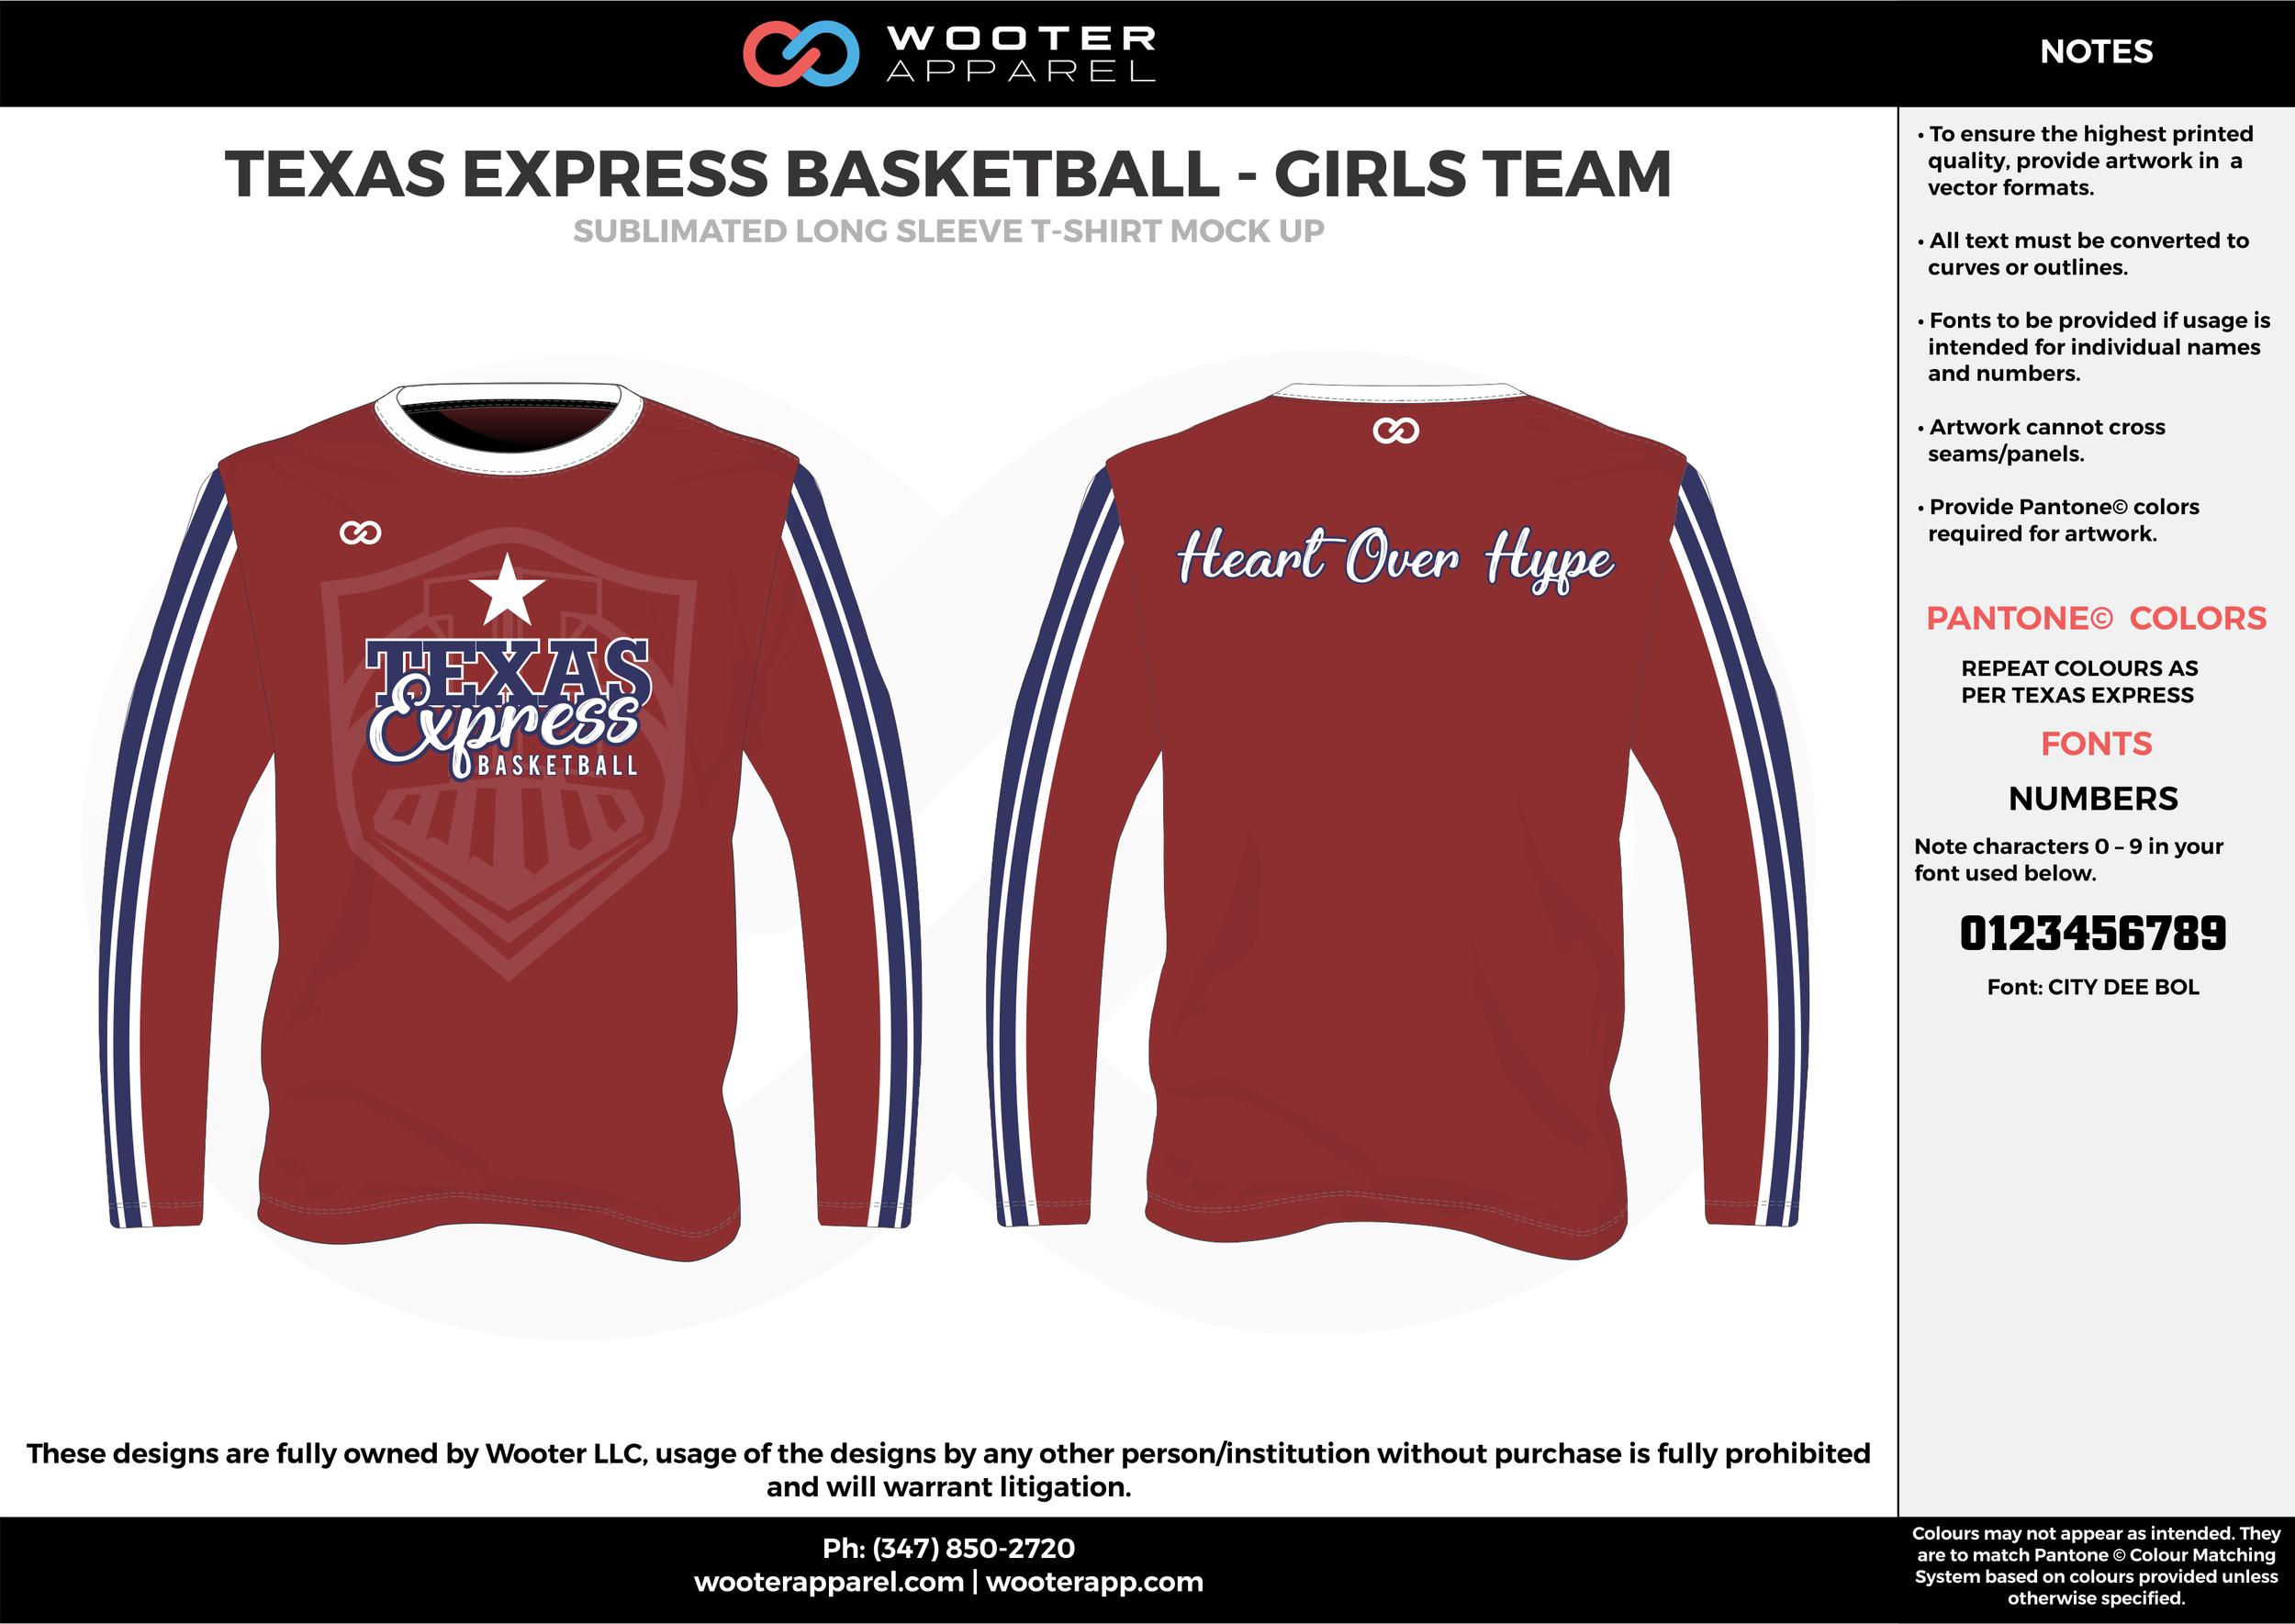 TEXAS EXPRESS BASKETBALL - GIRLS TEAM maroon blue white custom design t-shirts